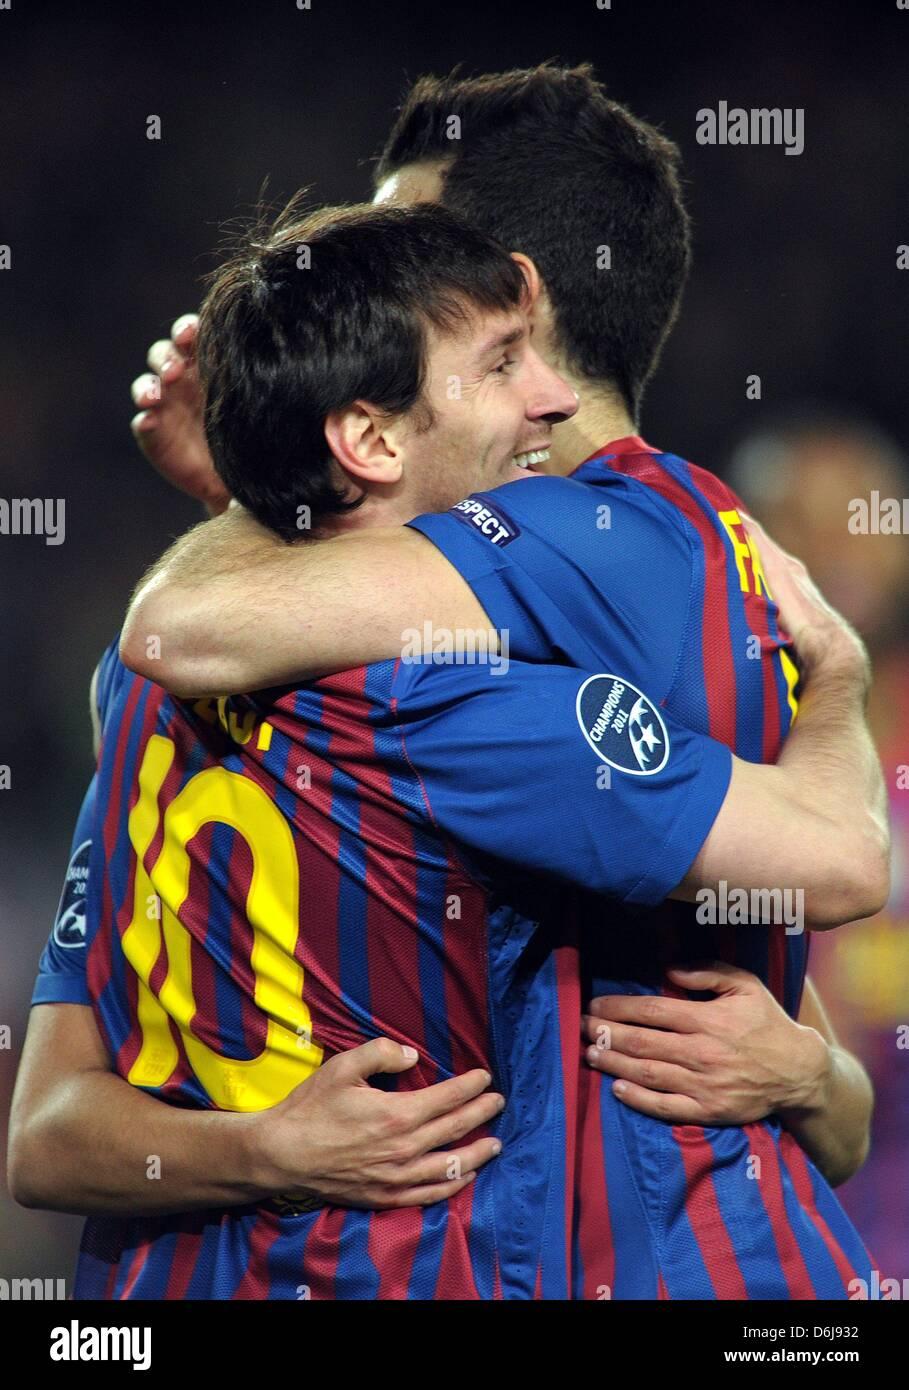 Barcelona S Lionel Messi L Celebrates With Team Mate Cesc Fabregas Stock Photo Alamy